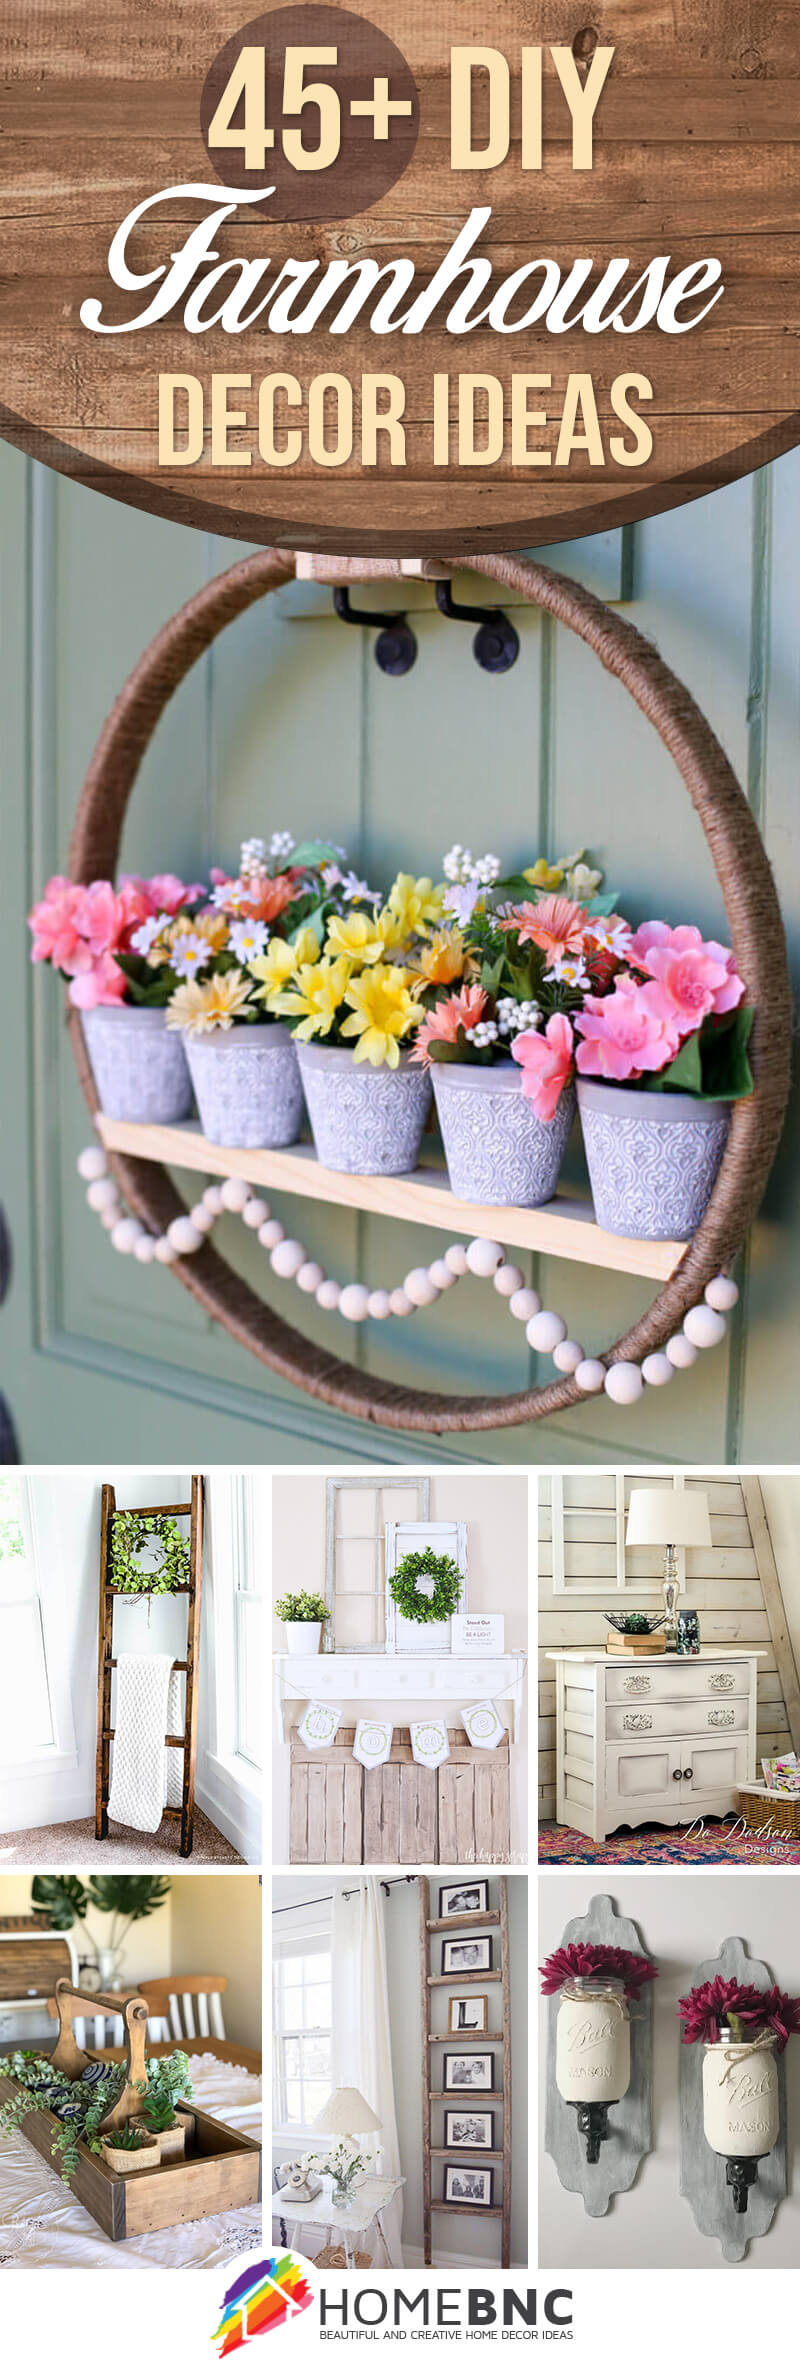 DIY Farmhouse Decorations